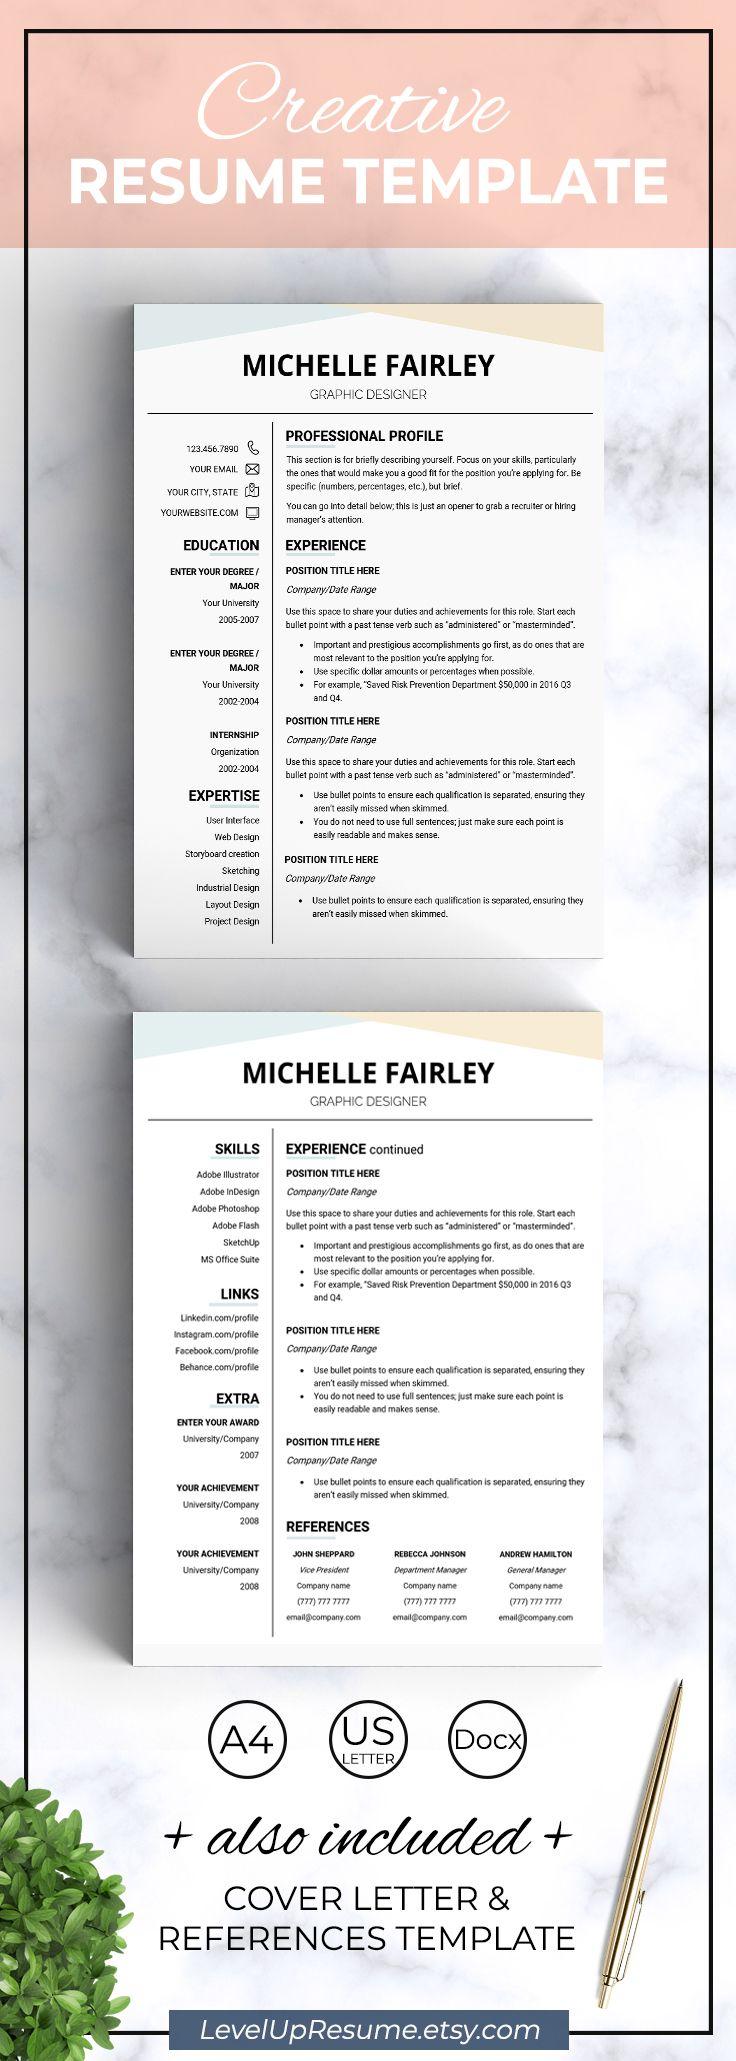 Modern Resume Template Resume Design Career Advice Job Search